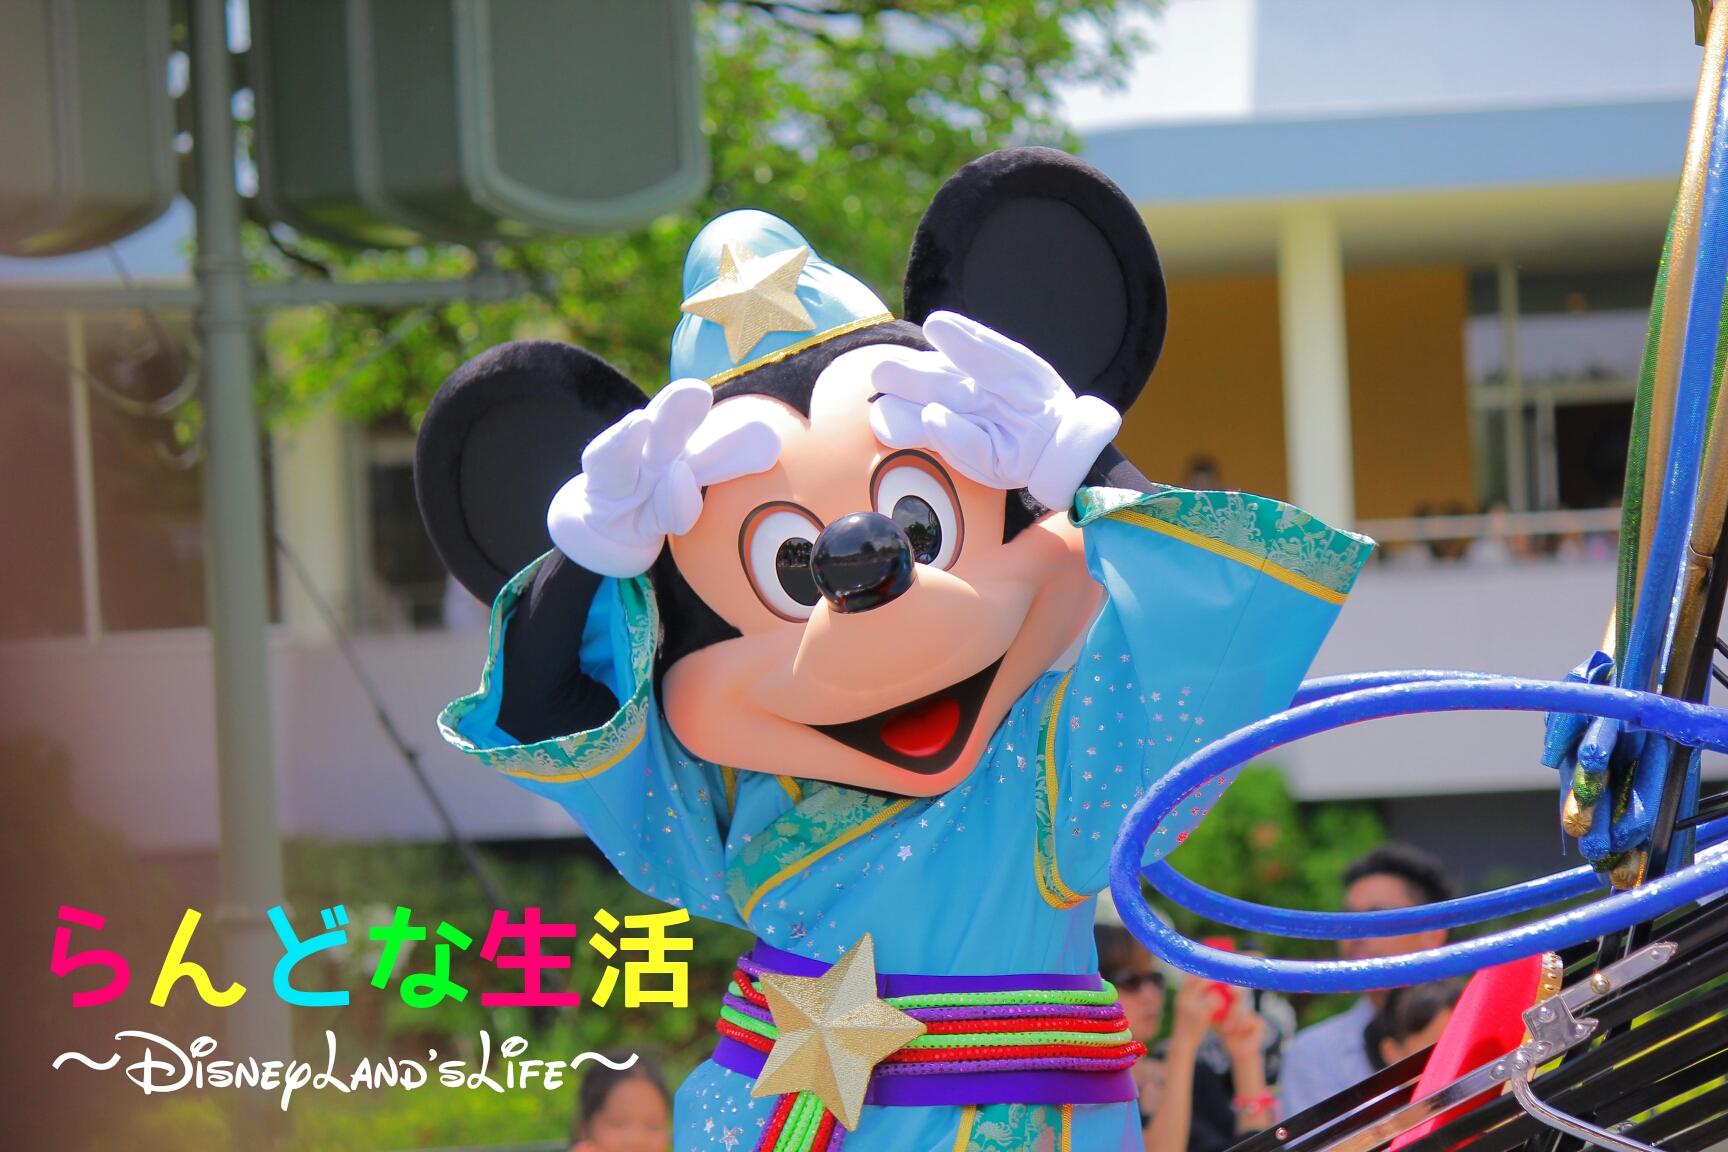 tanabata16_ミッキー007.jpg